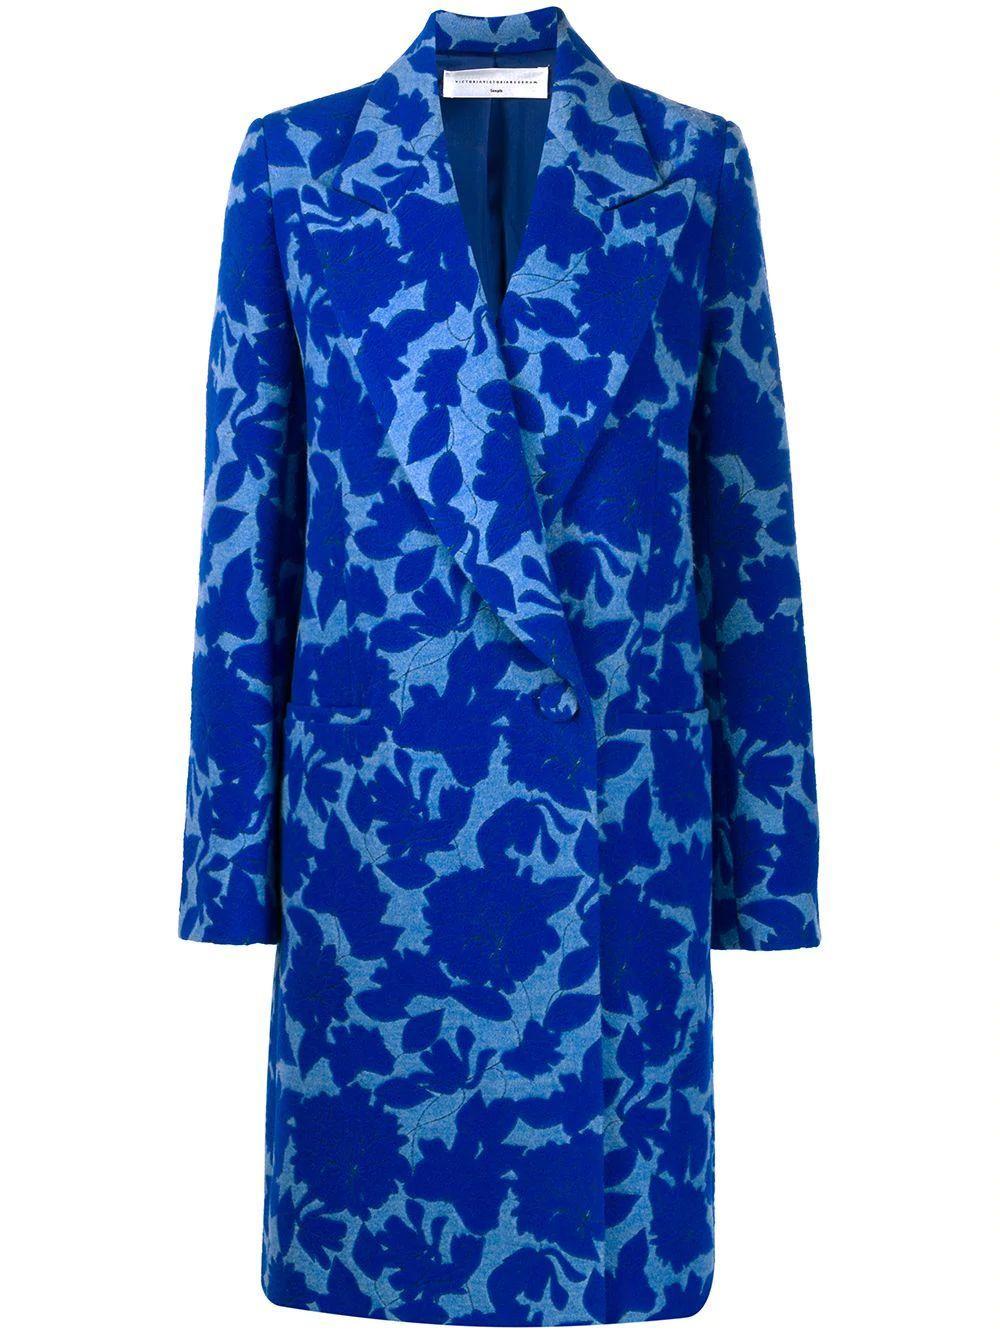 Long Jacquard Coat Item # 2419WCT000114A